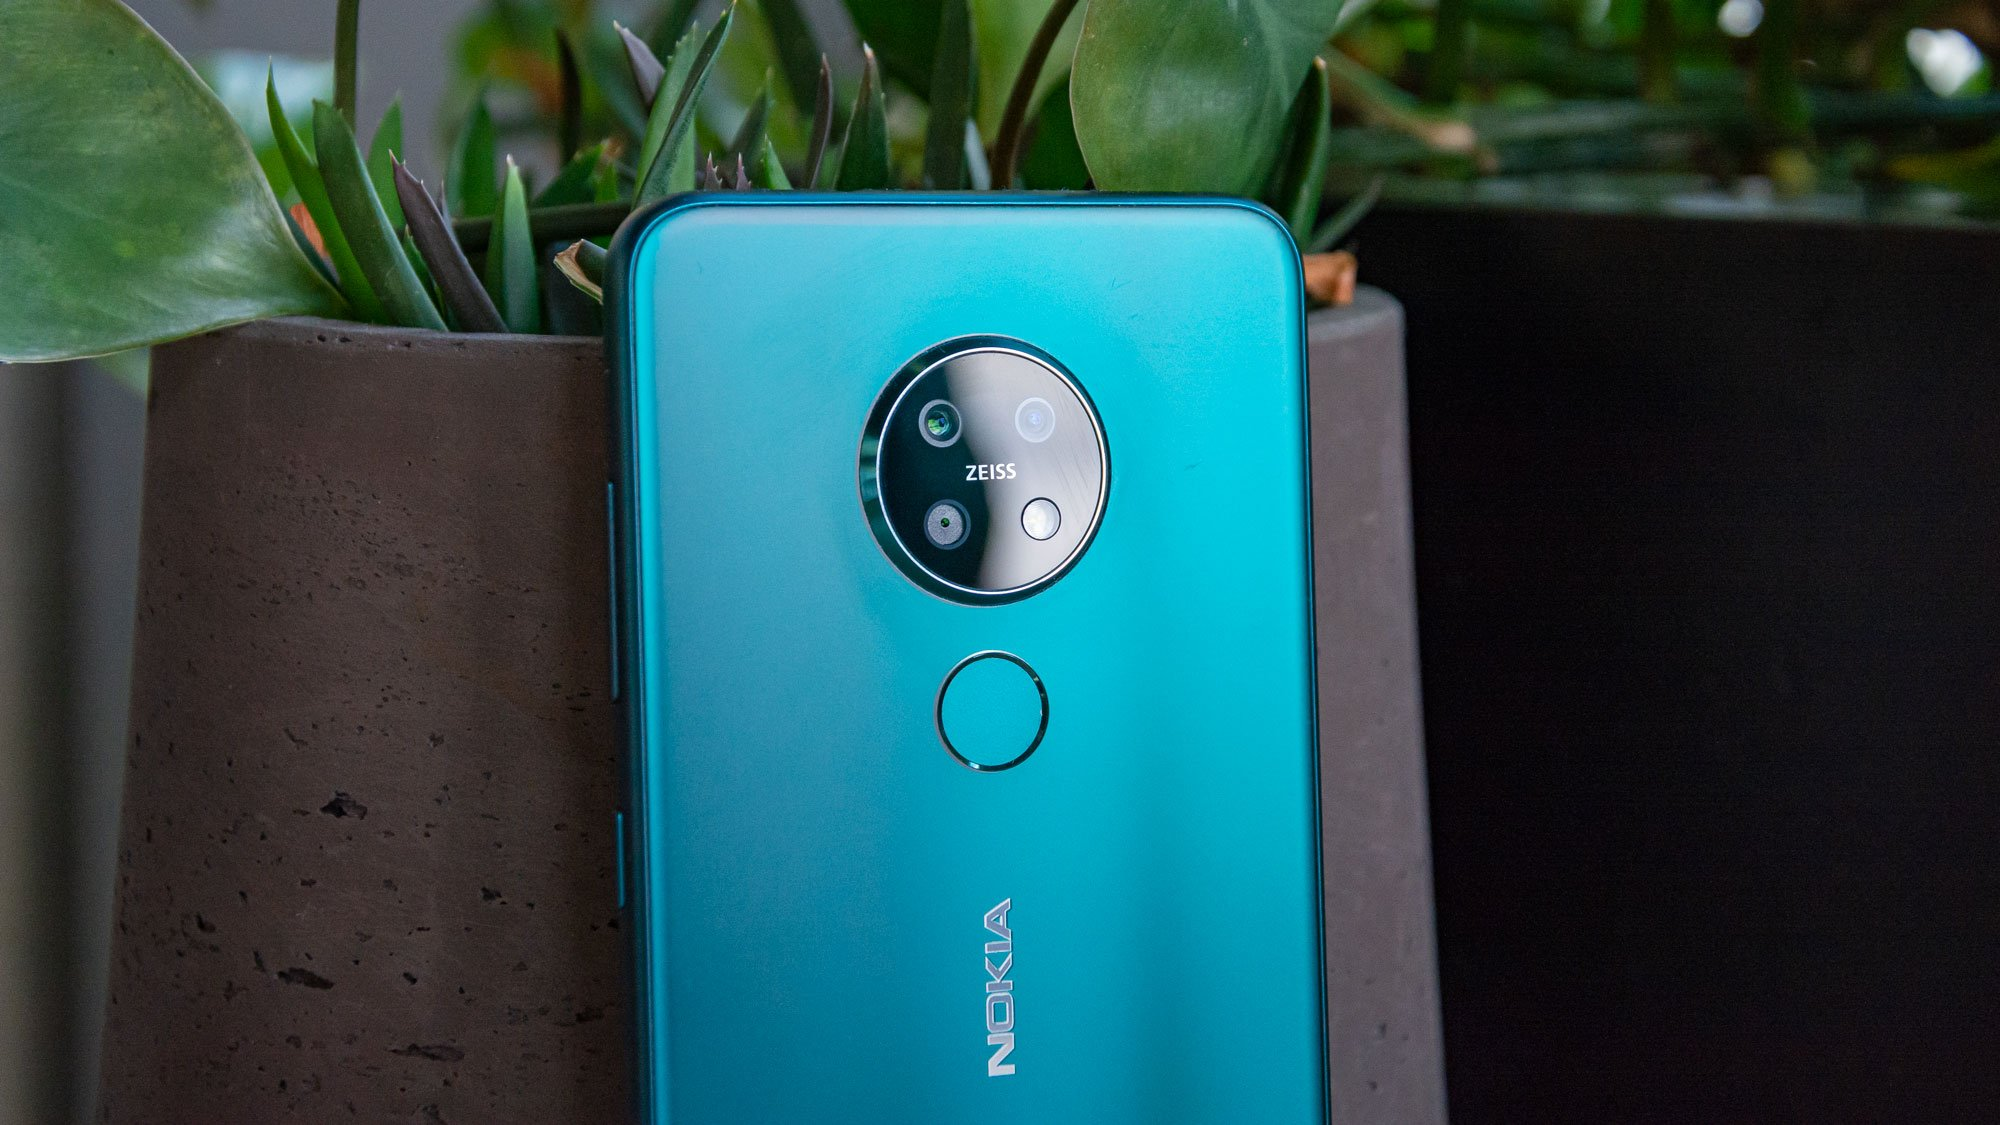 Nokia Resmi Rilis Gadget Terbarunya Dengan 3 Kamera Belakang, Nokia 7.2 & 6.2